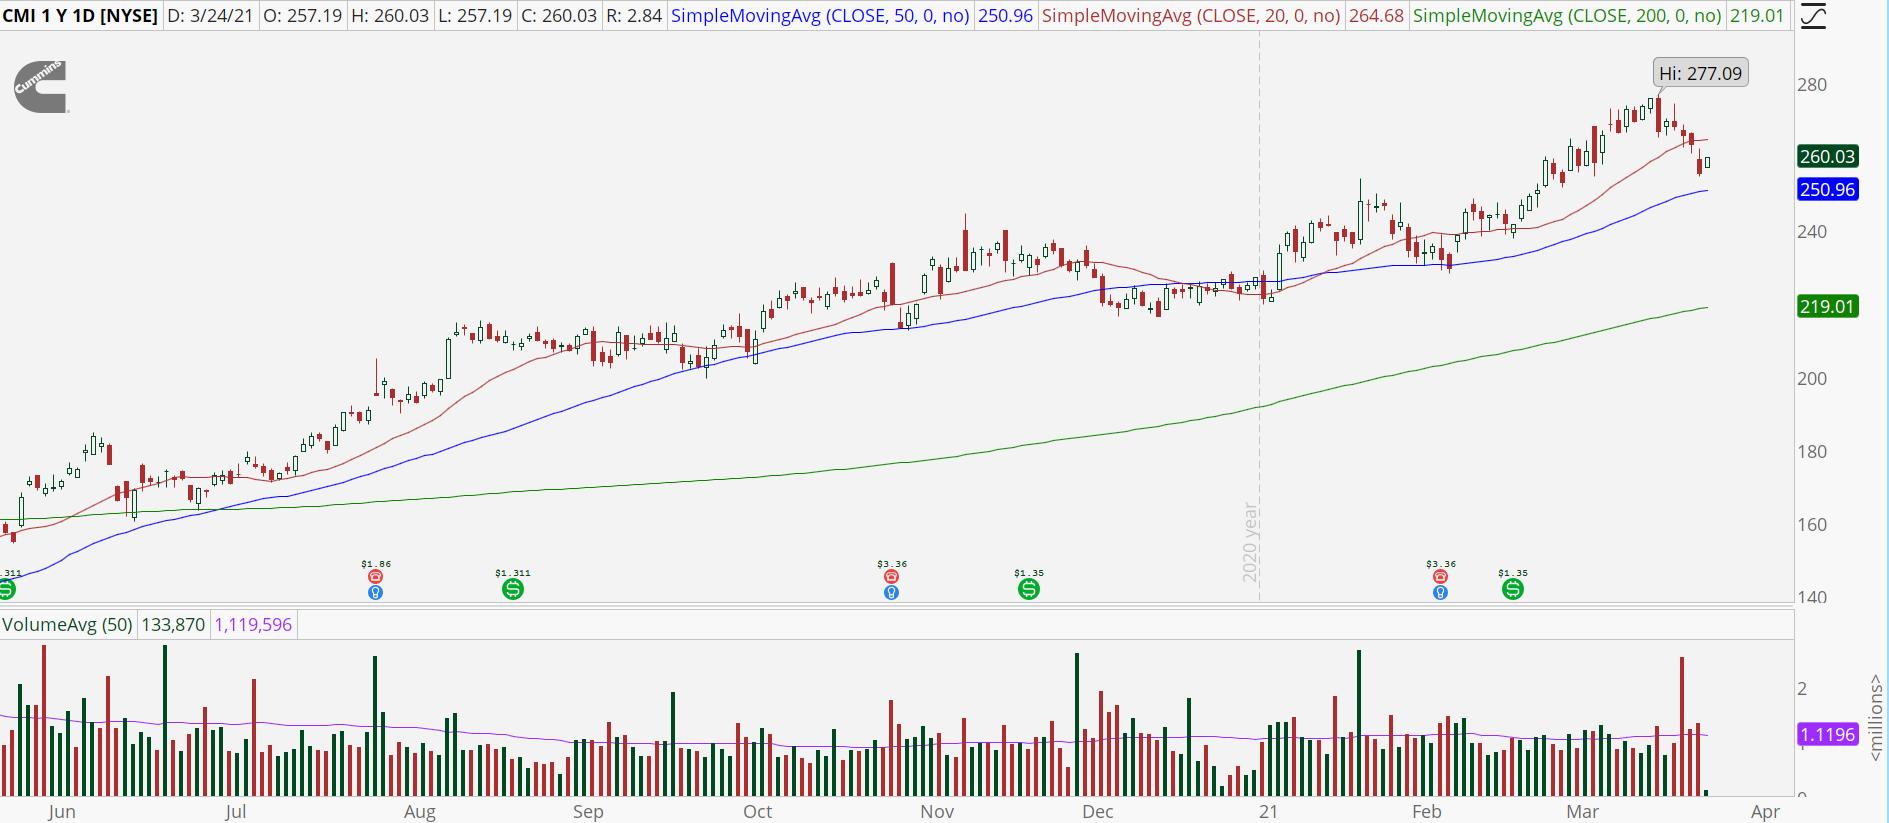 Cummins (CMI) stock chart with bull retracement